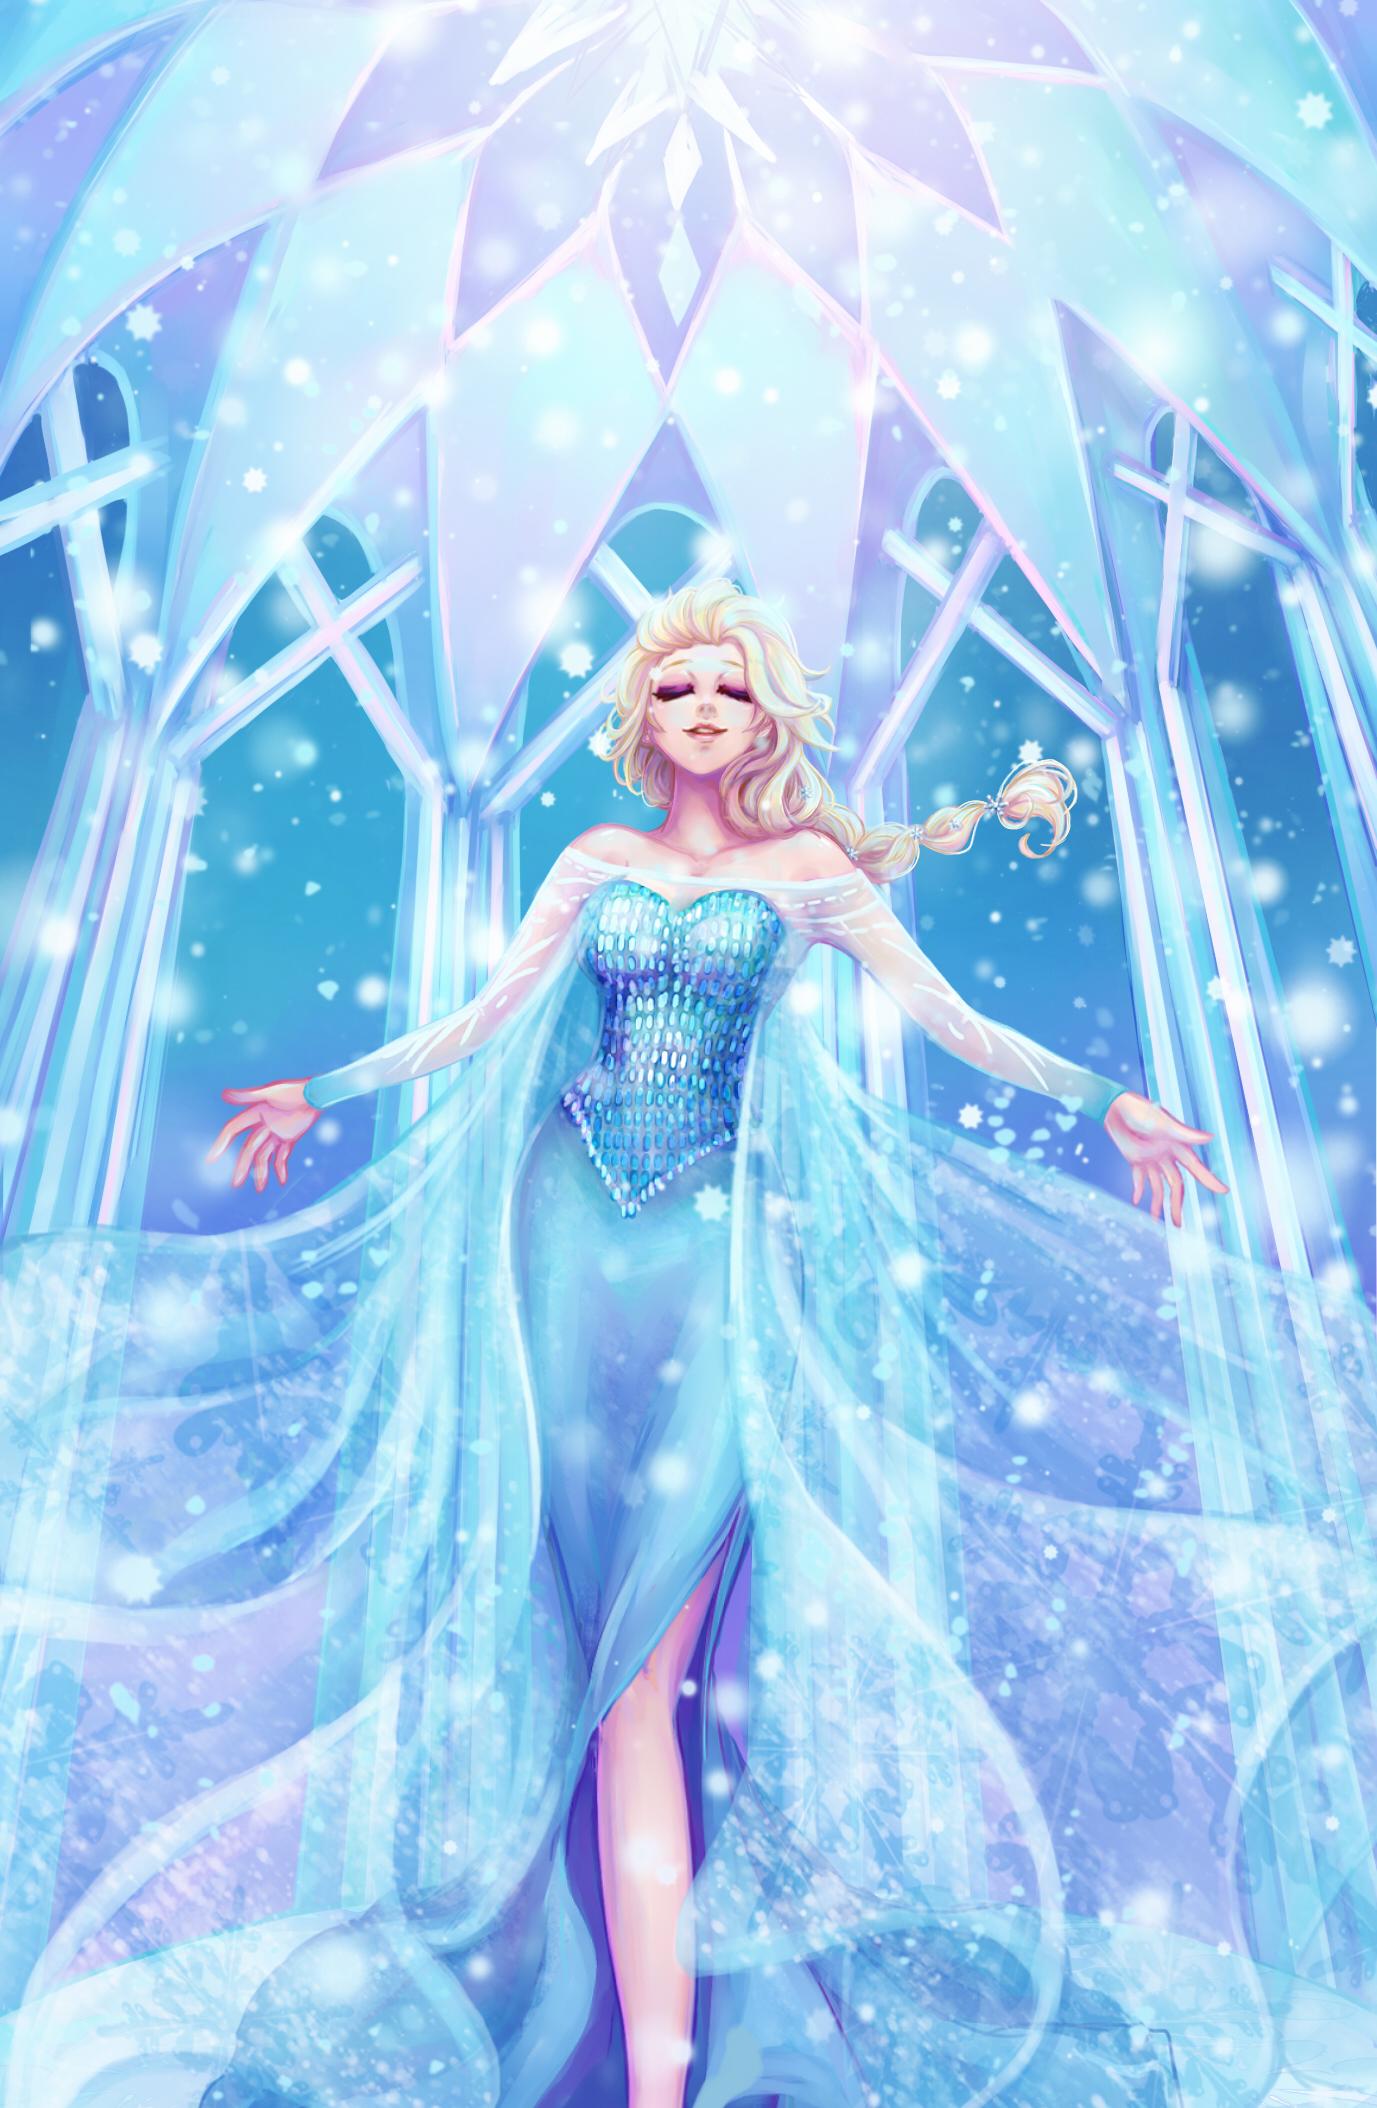 Wallpaper Gambar Kartun Film Beku Putri Elsa Karya